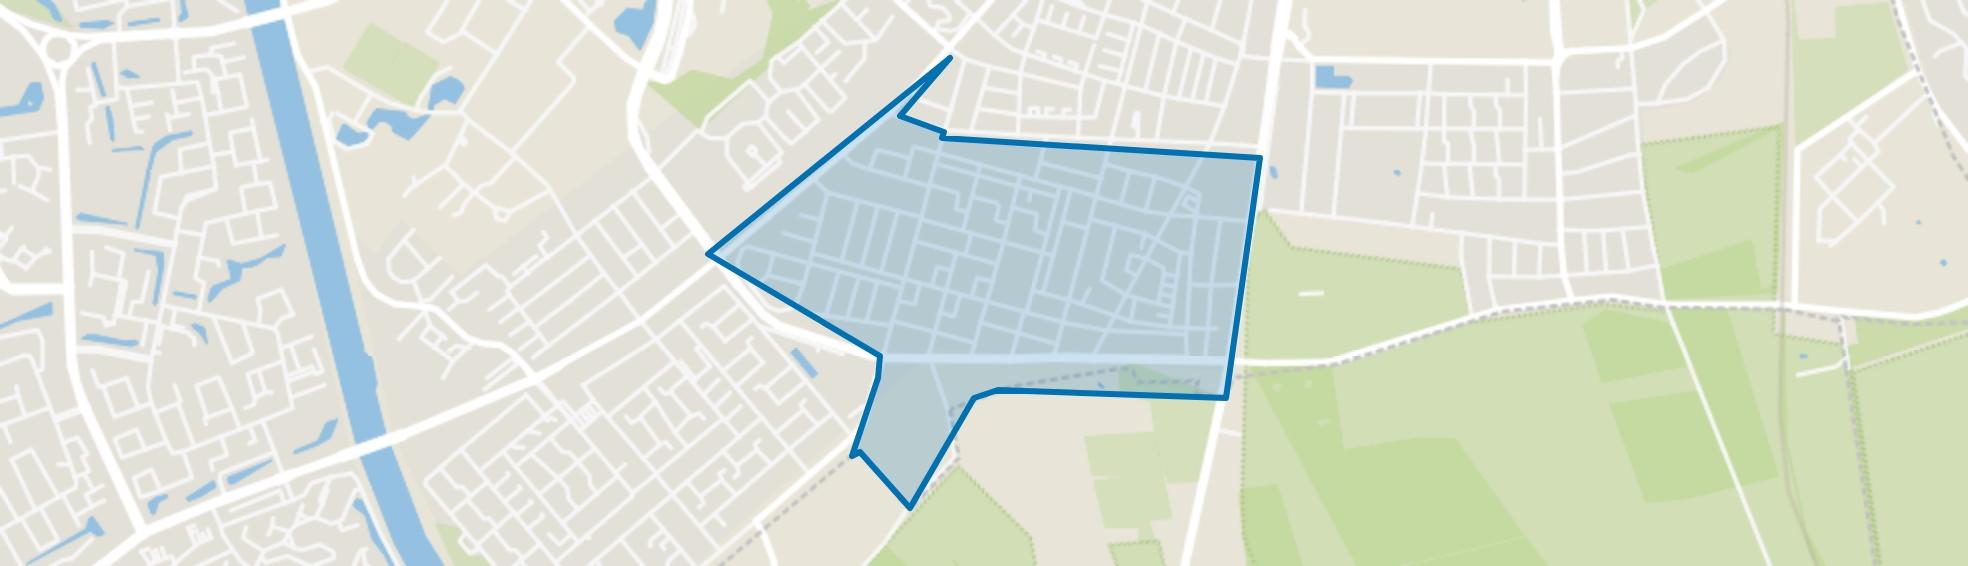 Grootstal, Nijmegen map